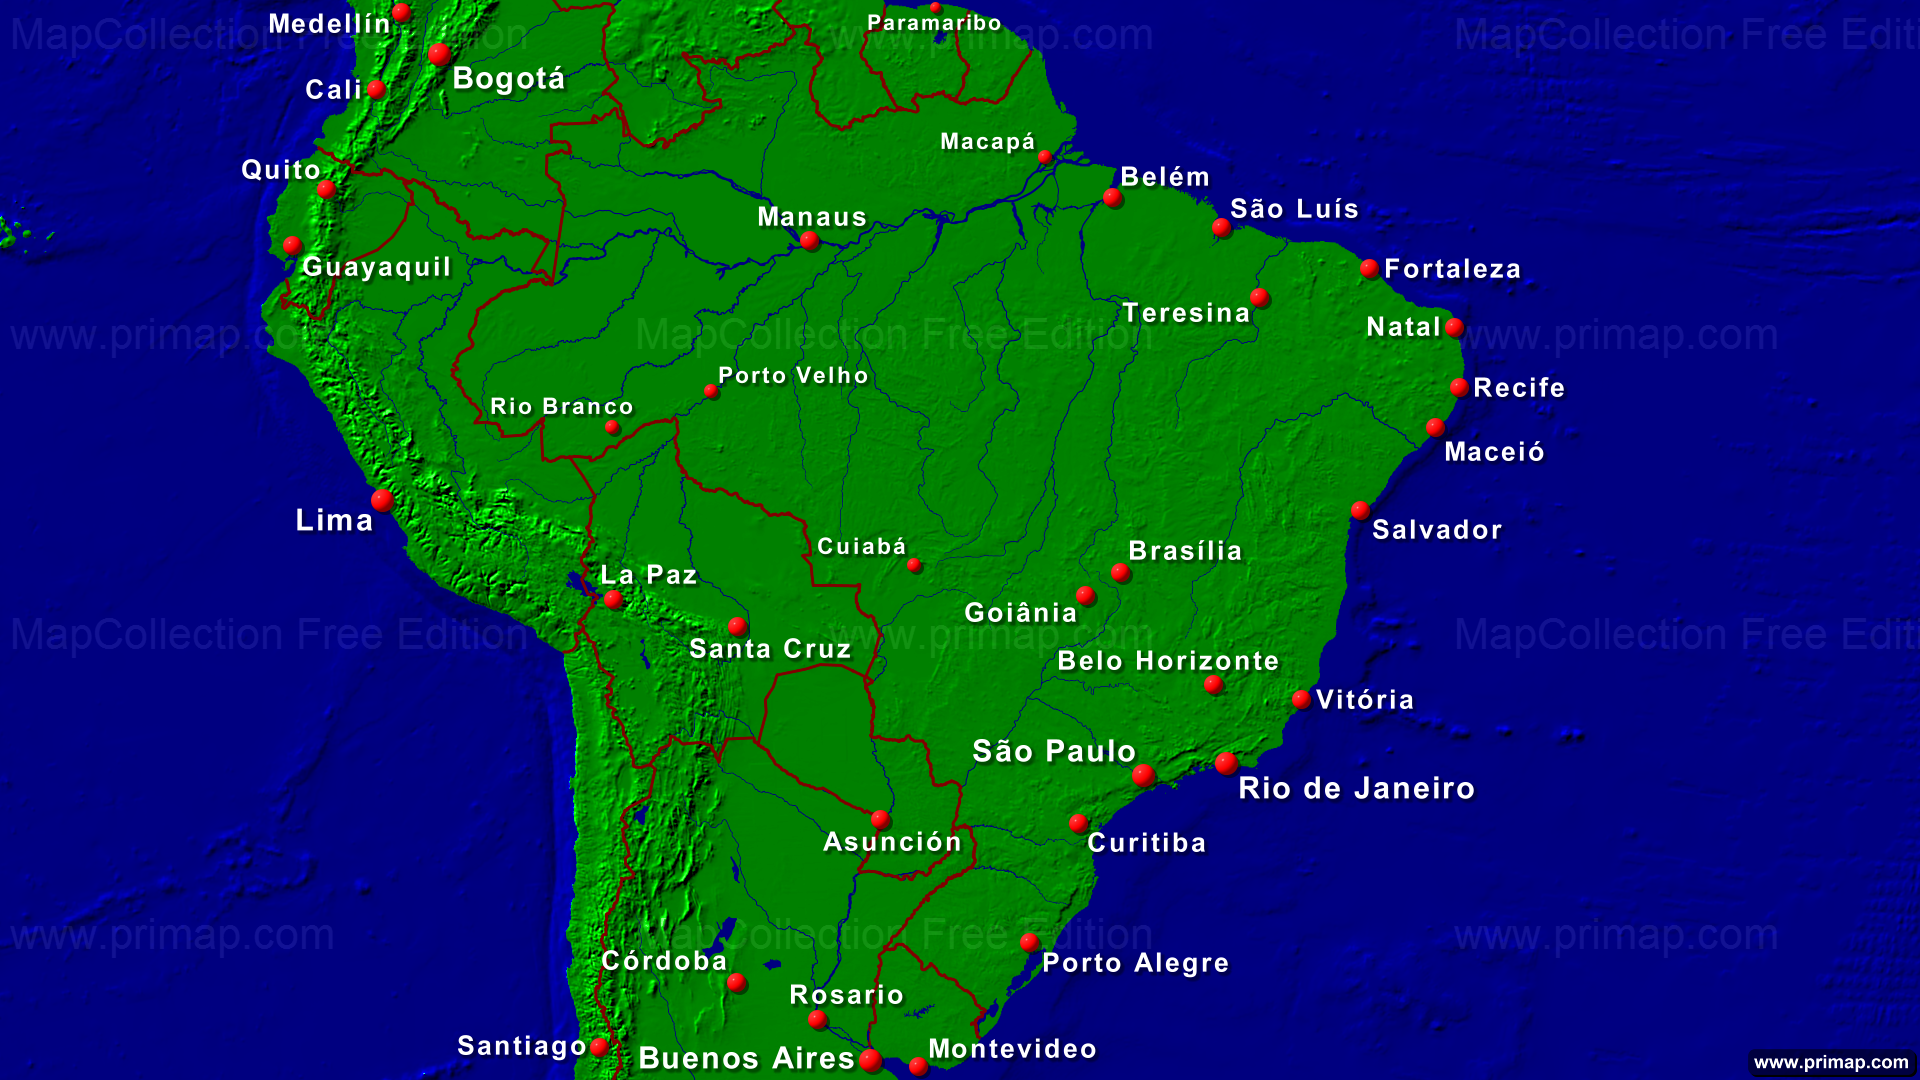 karte brasilien städte Karte Brasilien Mit Städten | goudenelftal